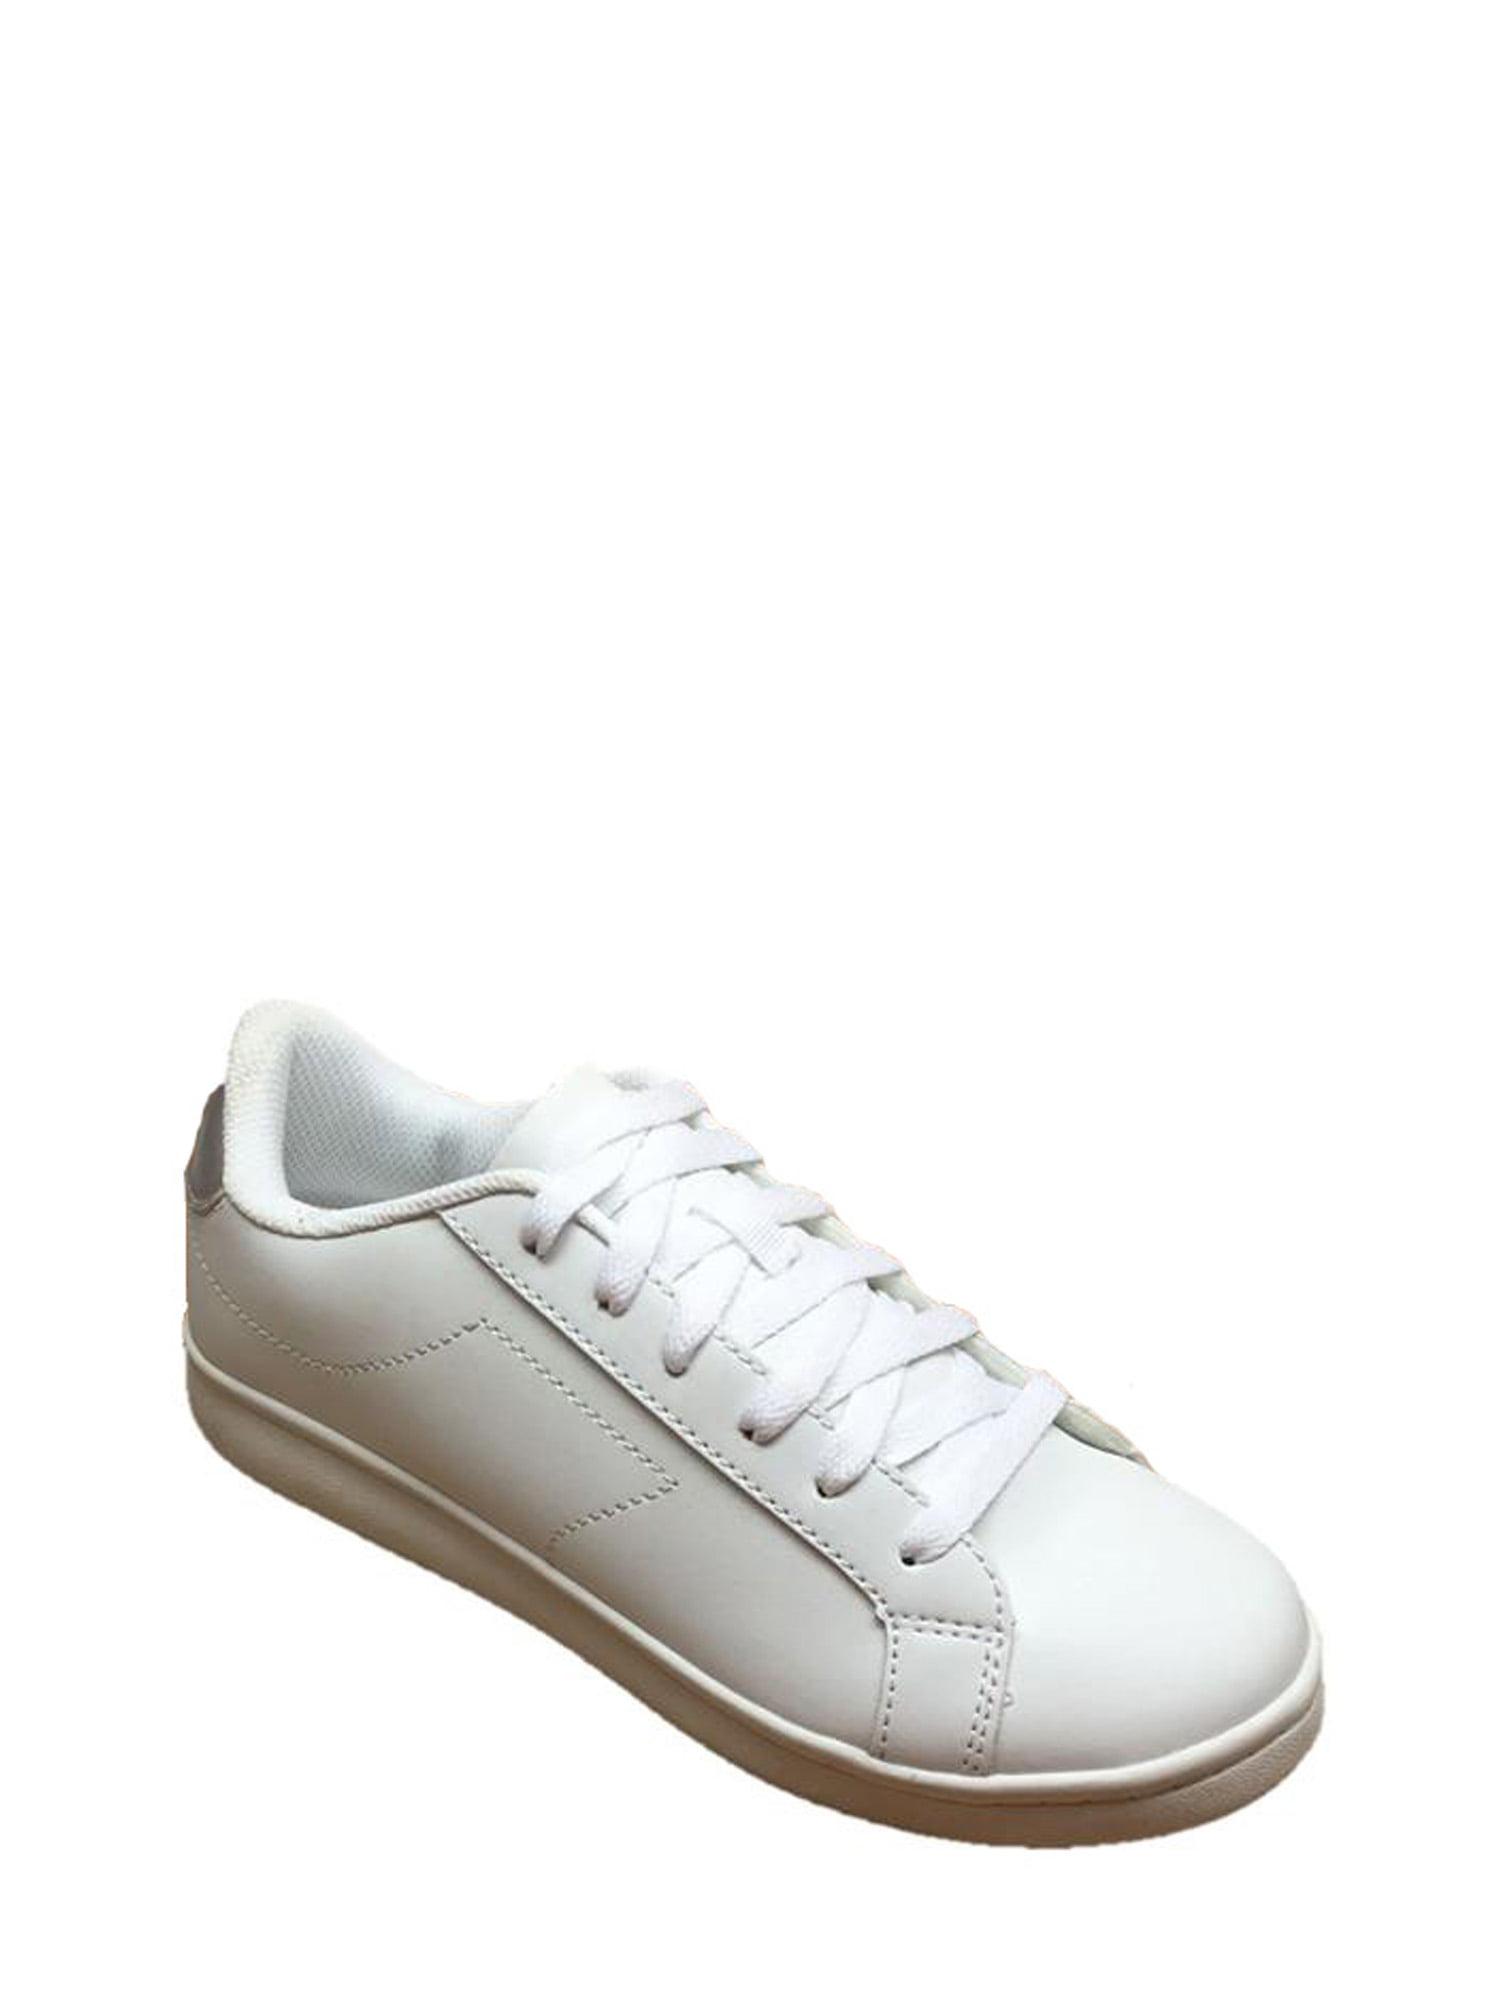 and Tru Court Sneaker